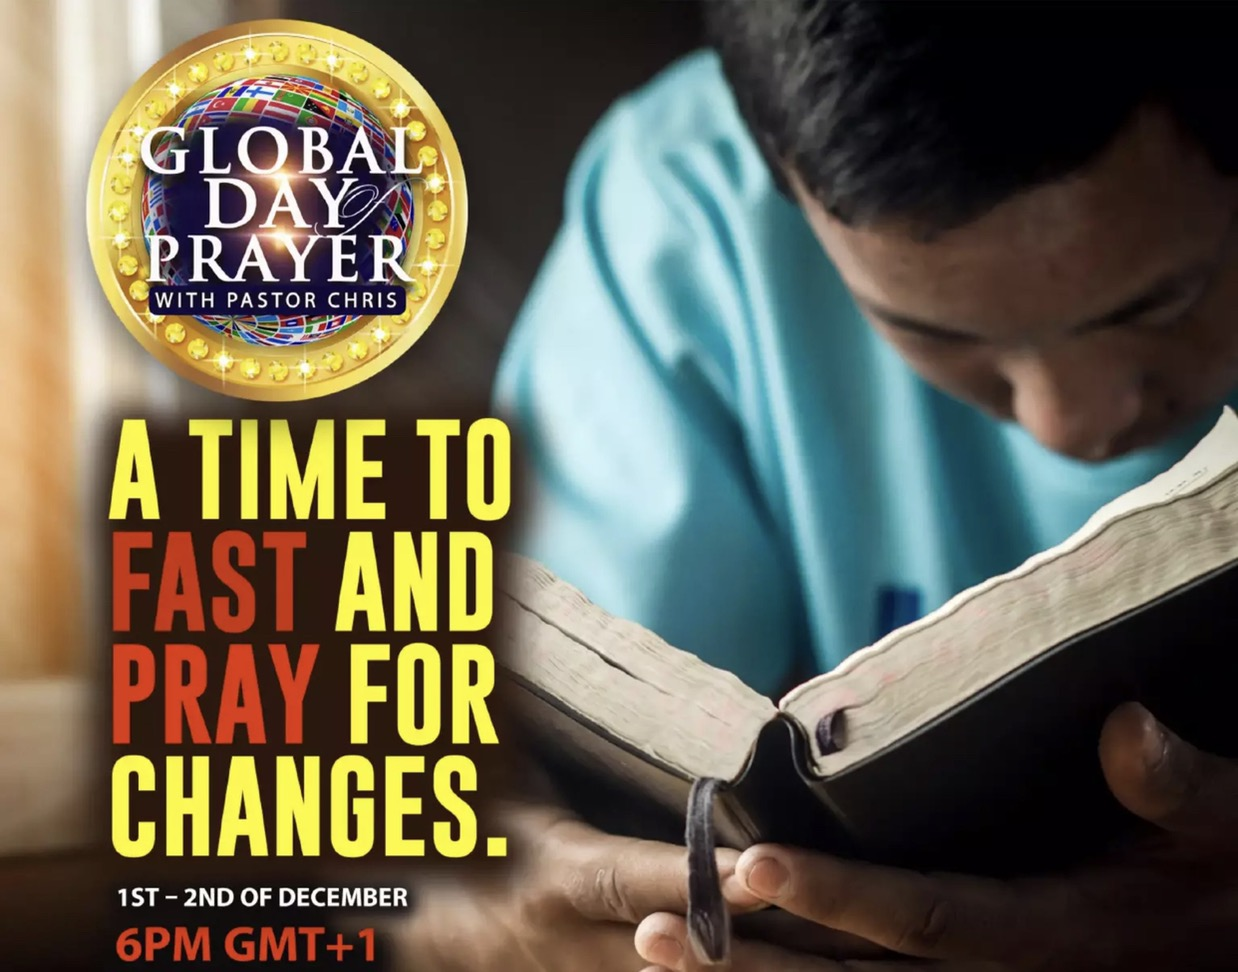 💥GLOBAL DAY OF PRAYER DECEMBER